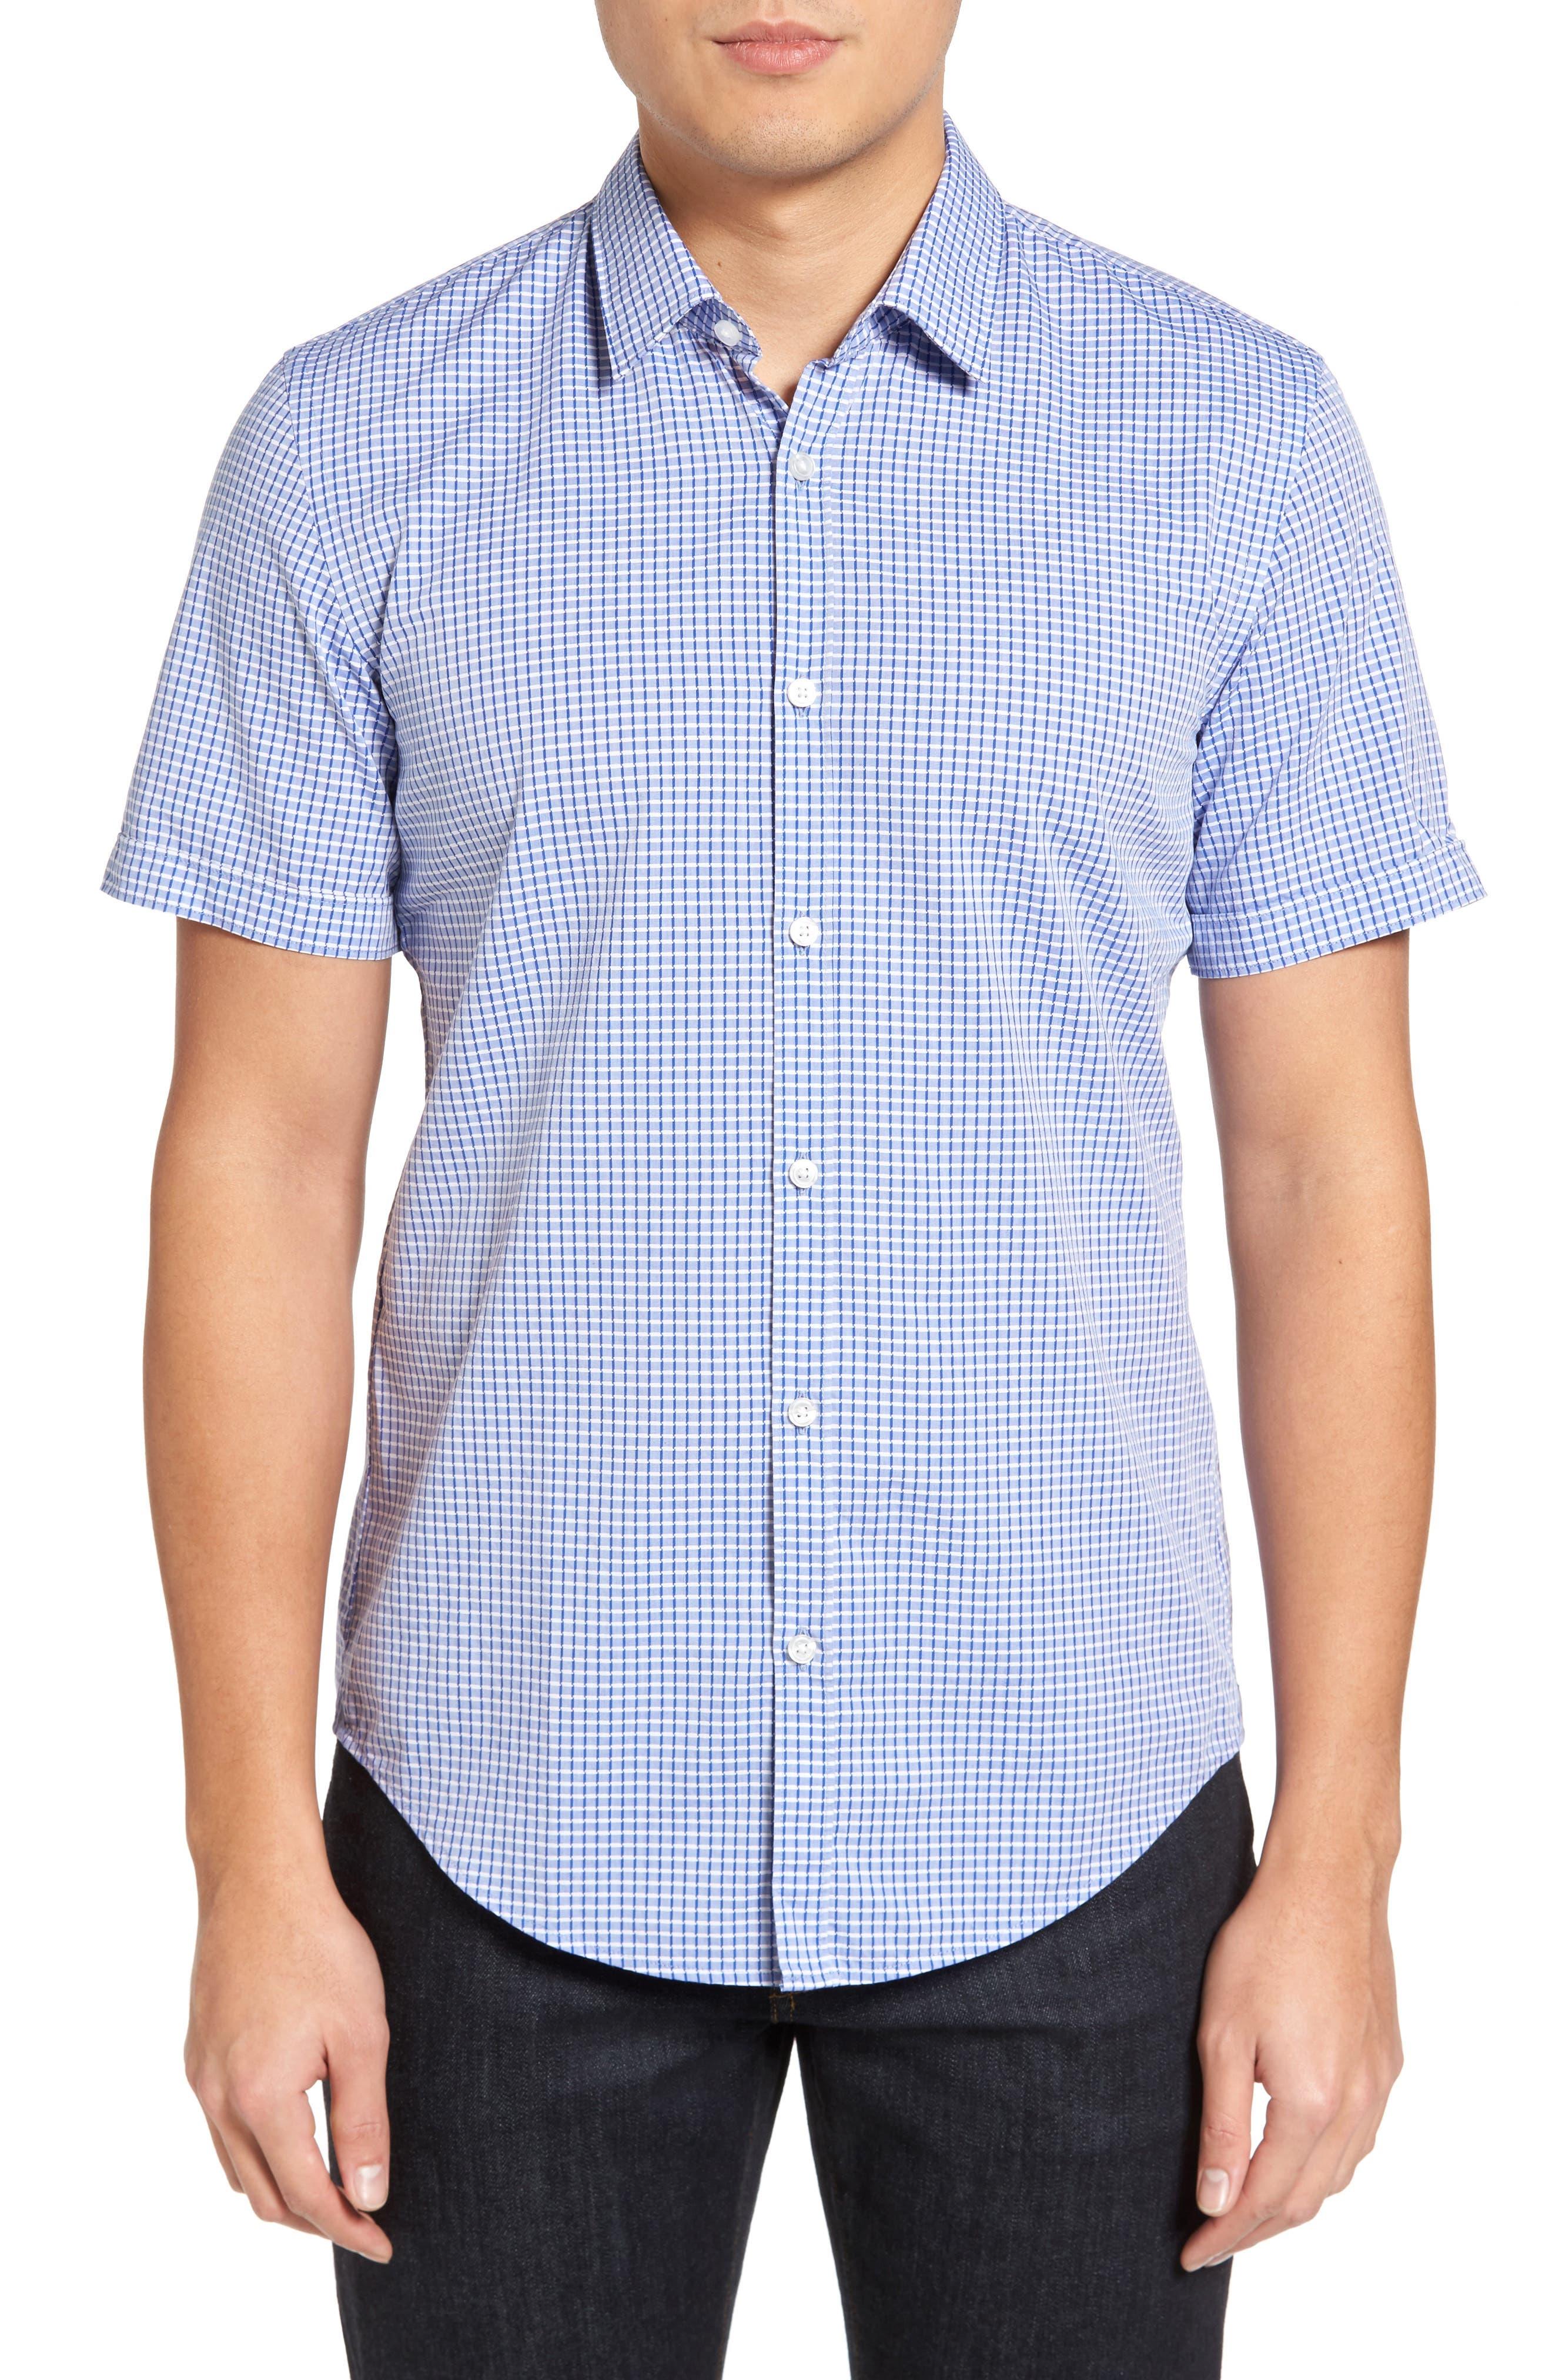 Ronn Check Sport Shirt,                         Main,                         color, Medium Blue